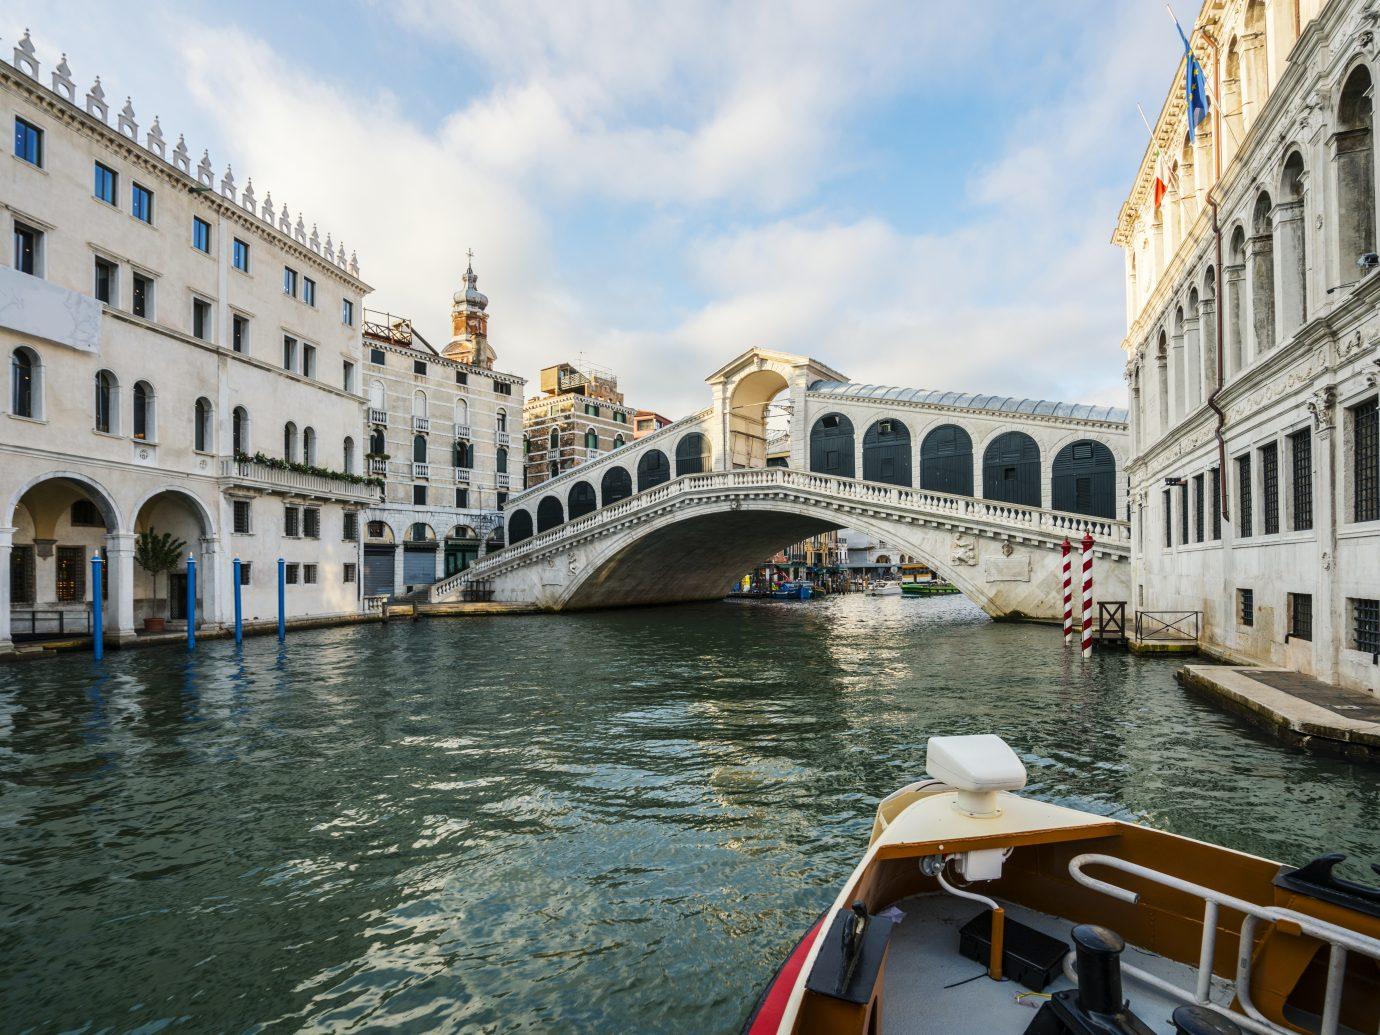 Boat On Grand Canal near famous Grand Rialto Bridge, Venice, Italy